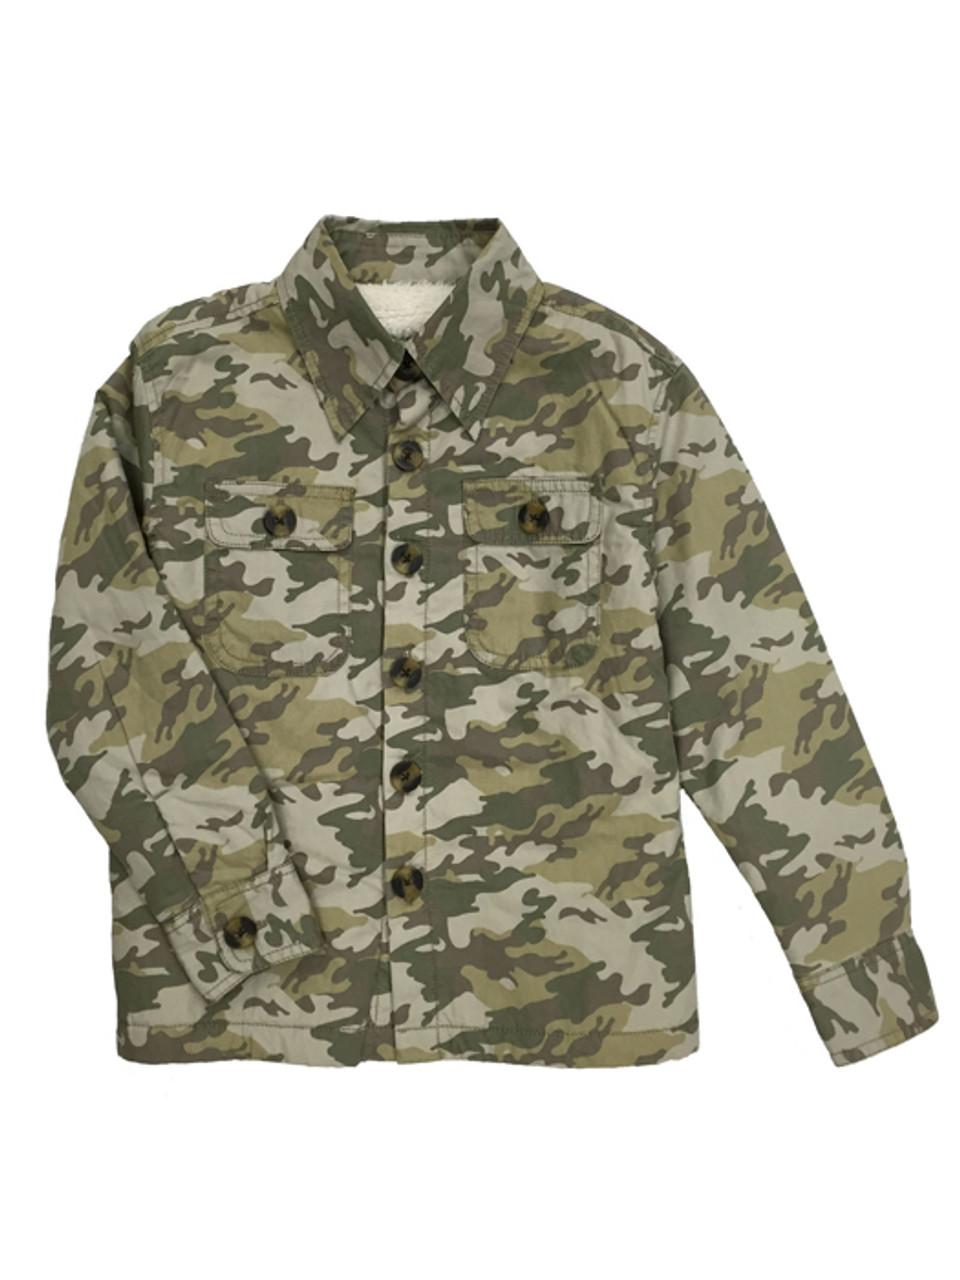 a27f6c862 Peek Toddler Boys Camo Jacket | Berri Kids Resale Boutique